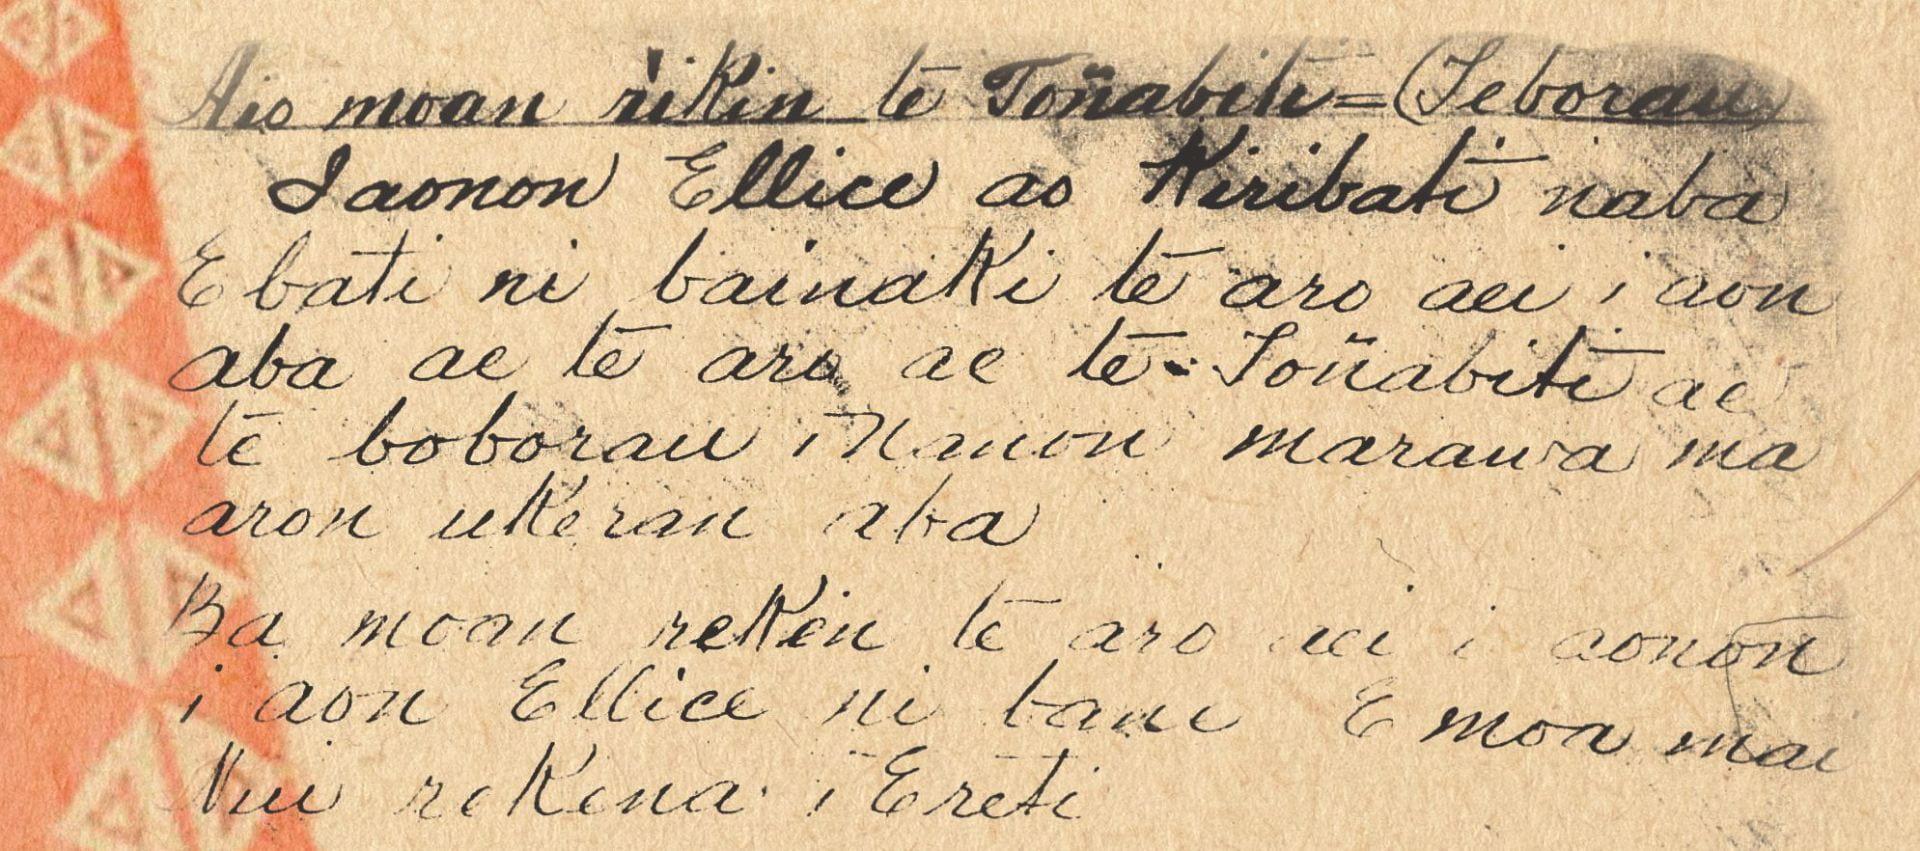 Handwritten Kiribati from the papers of Sir Arthur Grimble